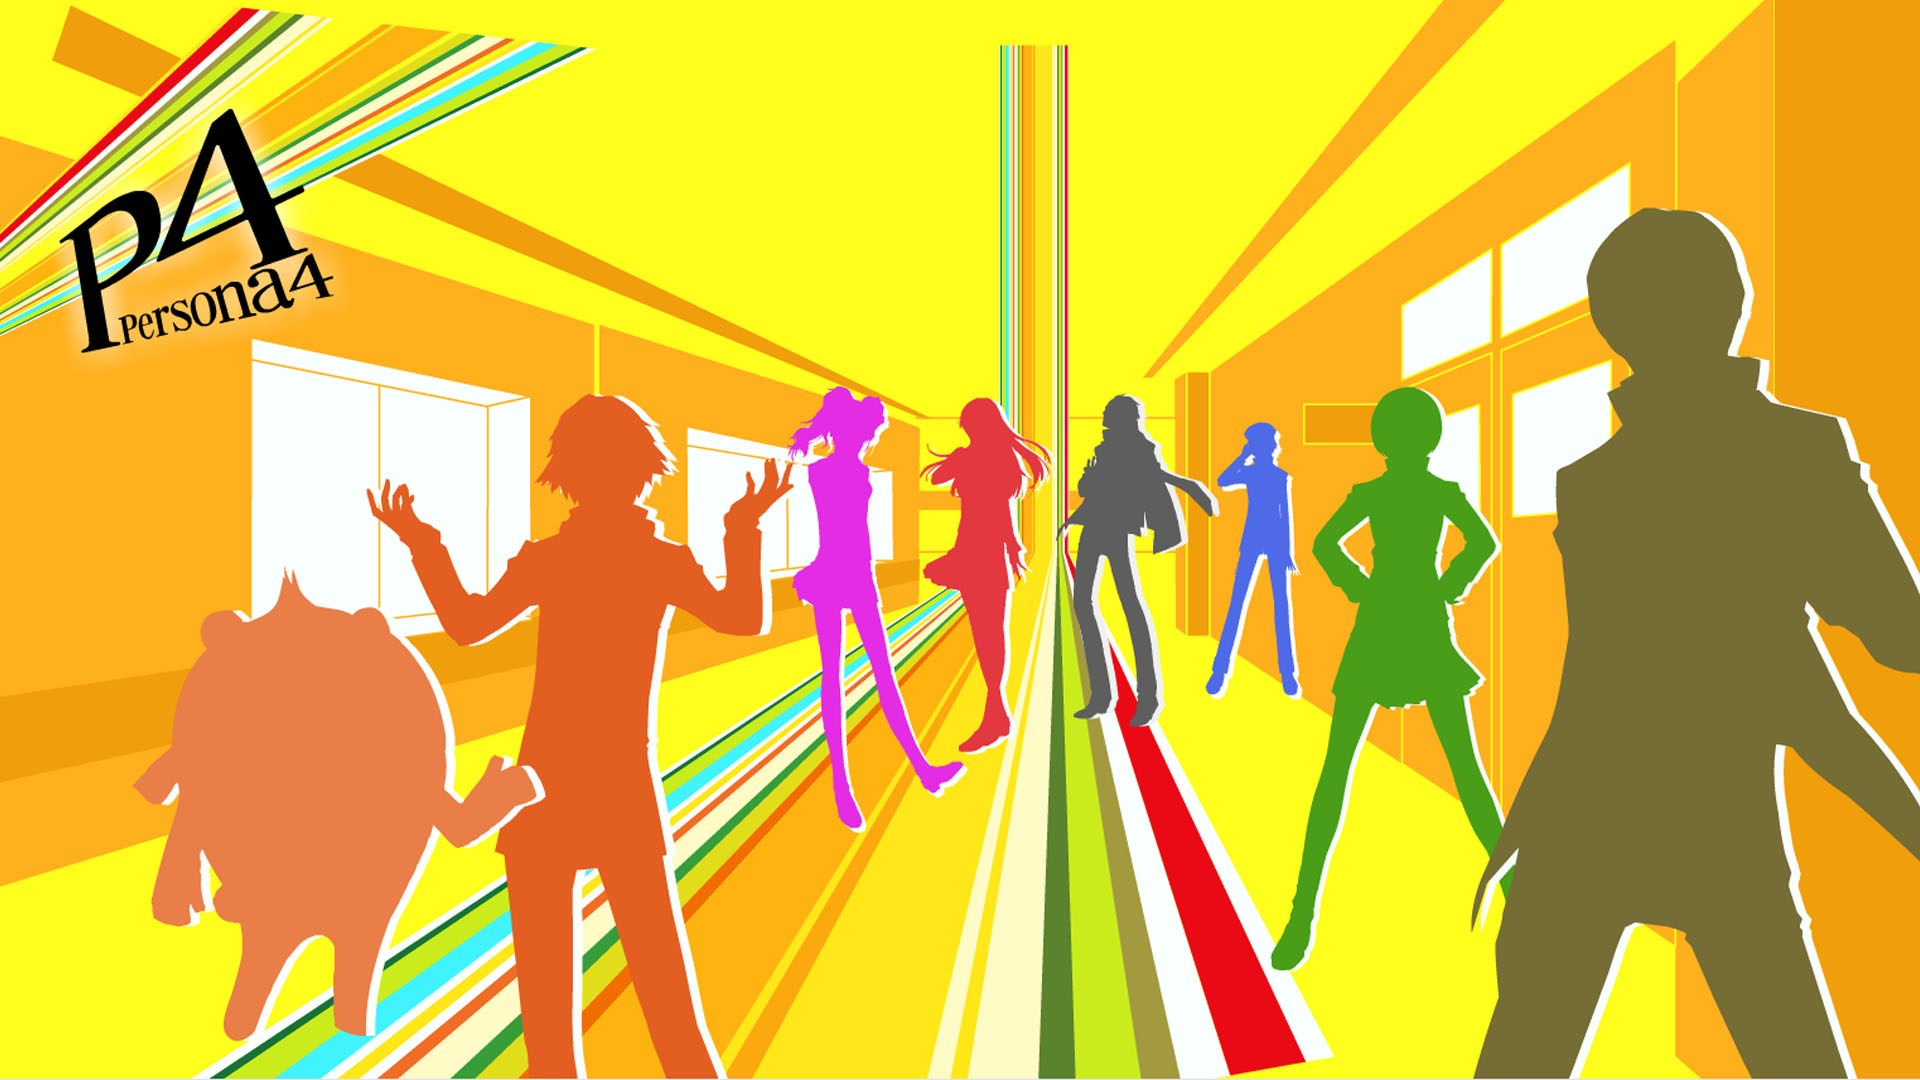 Video Game - Persona 4  Wallpaper